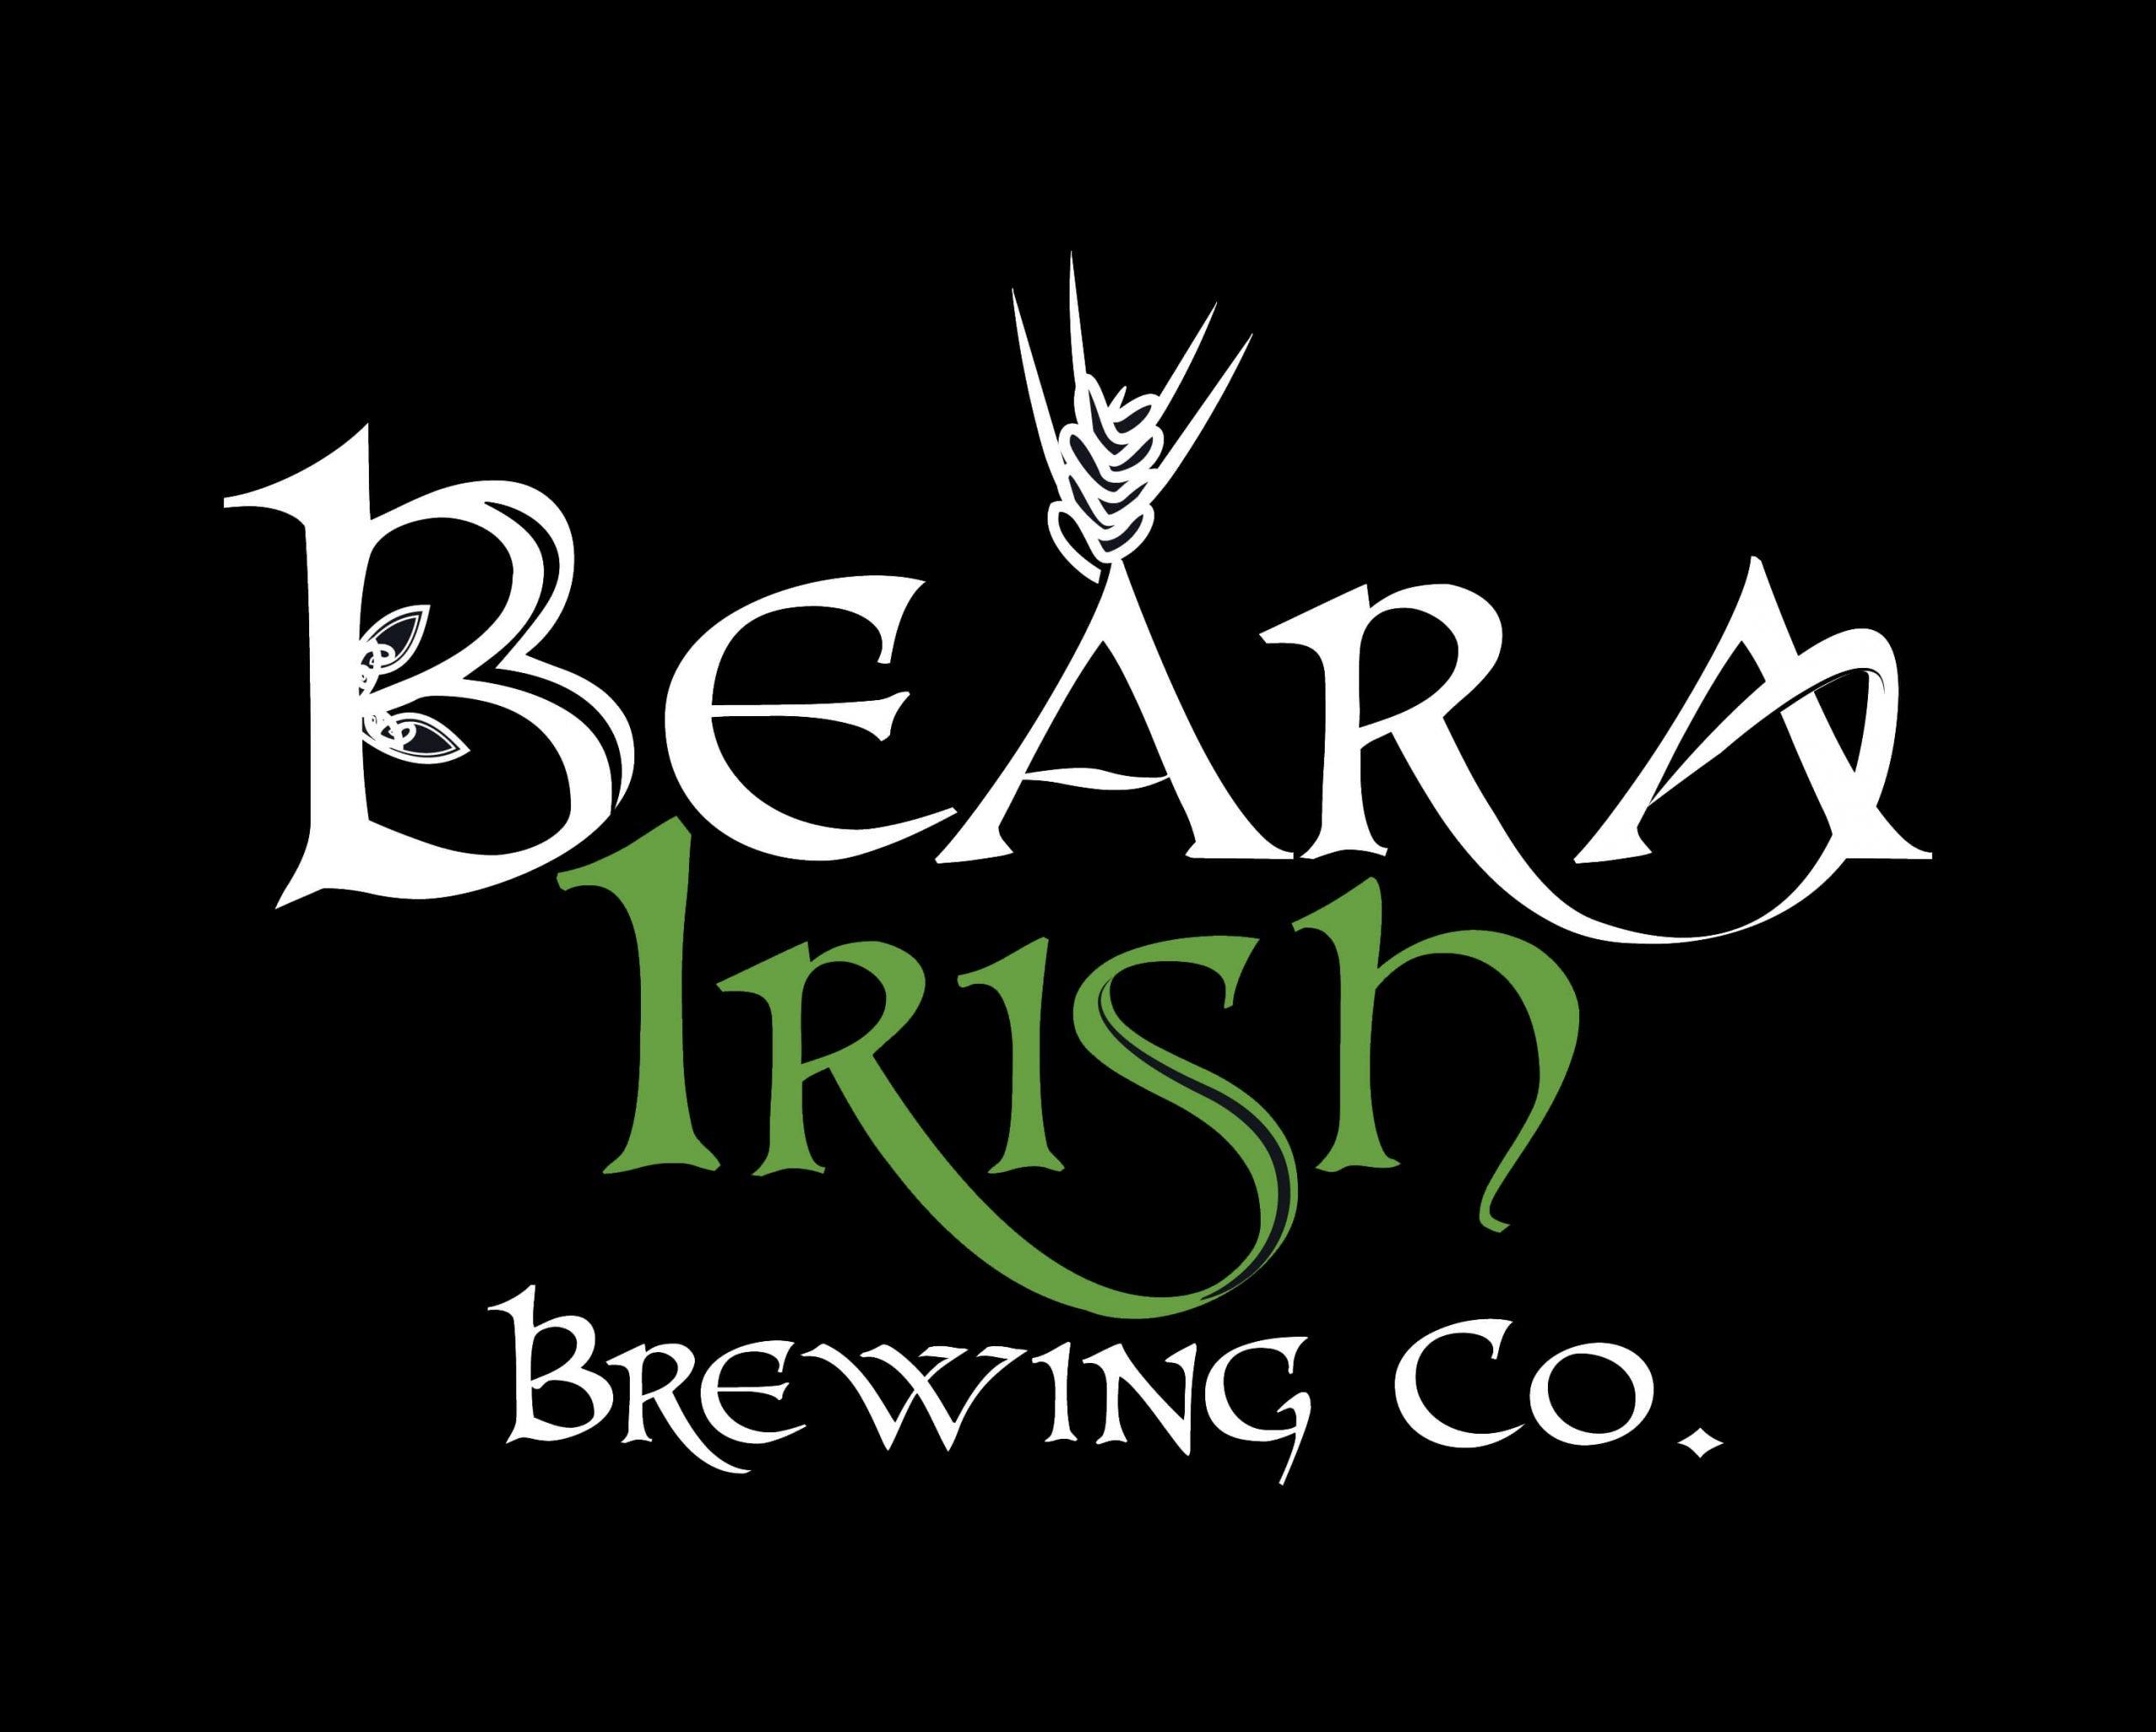 Beara Irish Brewing Company logo